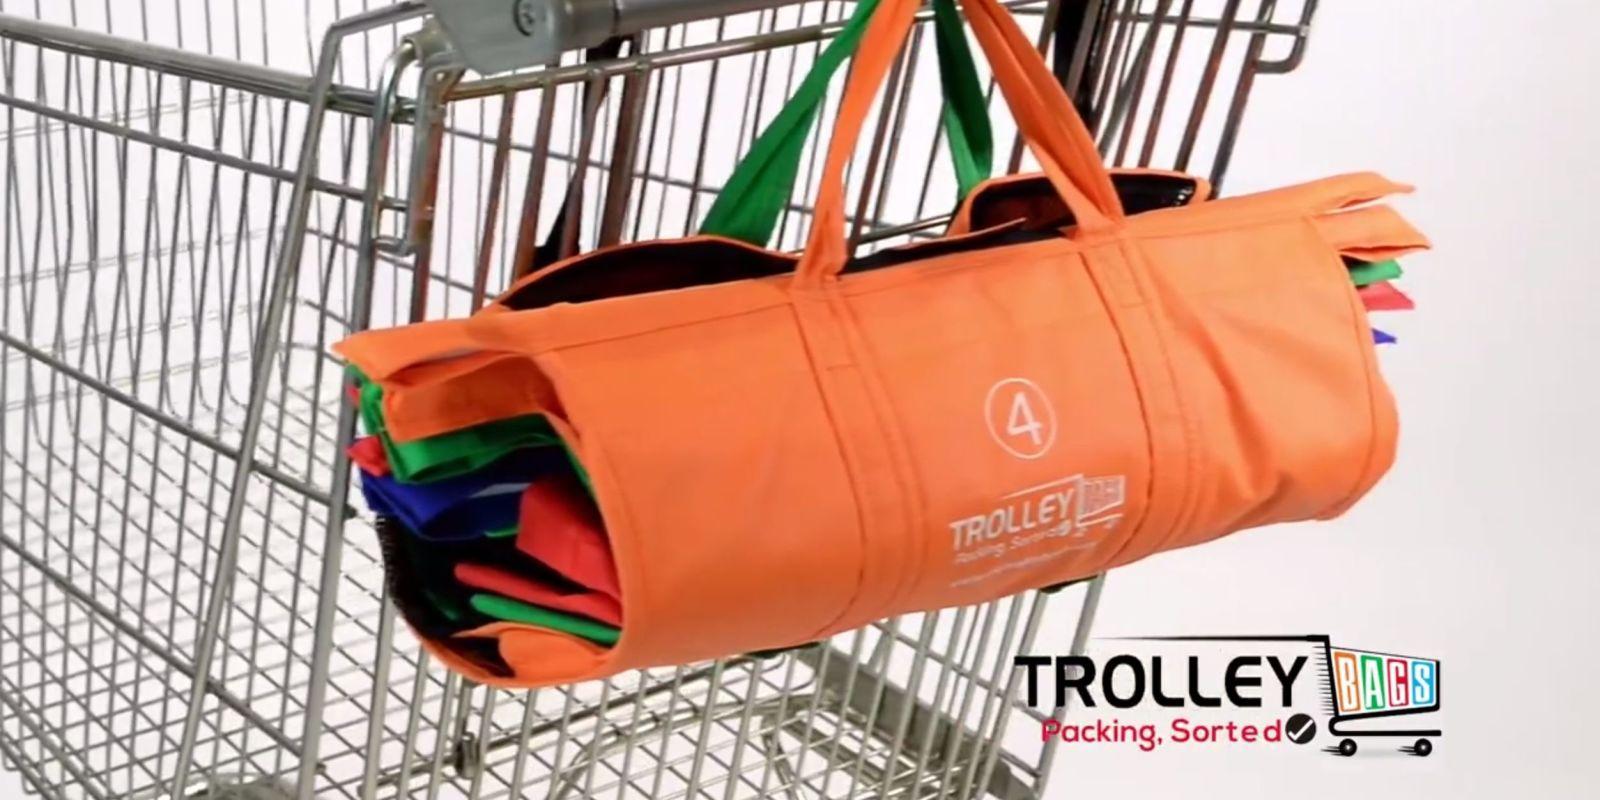 Waterproof Tourism Vintage Luggage Suitcase Travel Bags Trolley ...